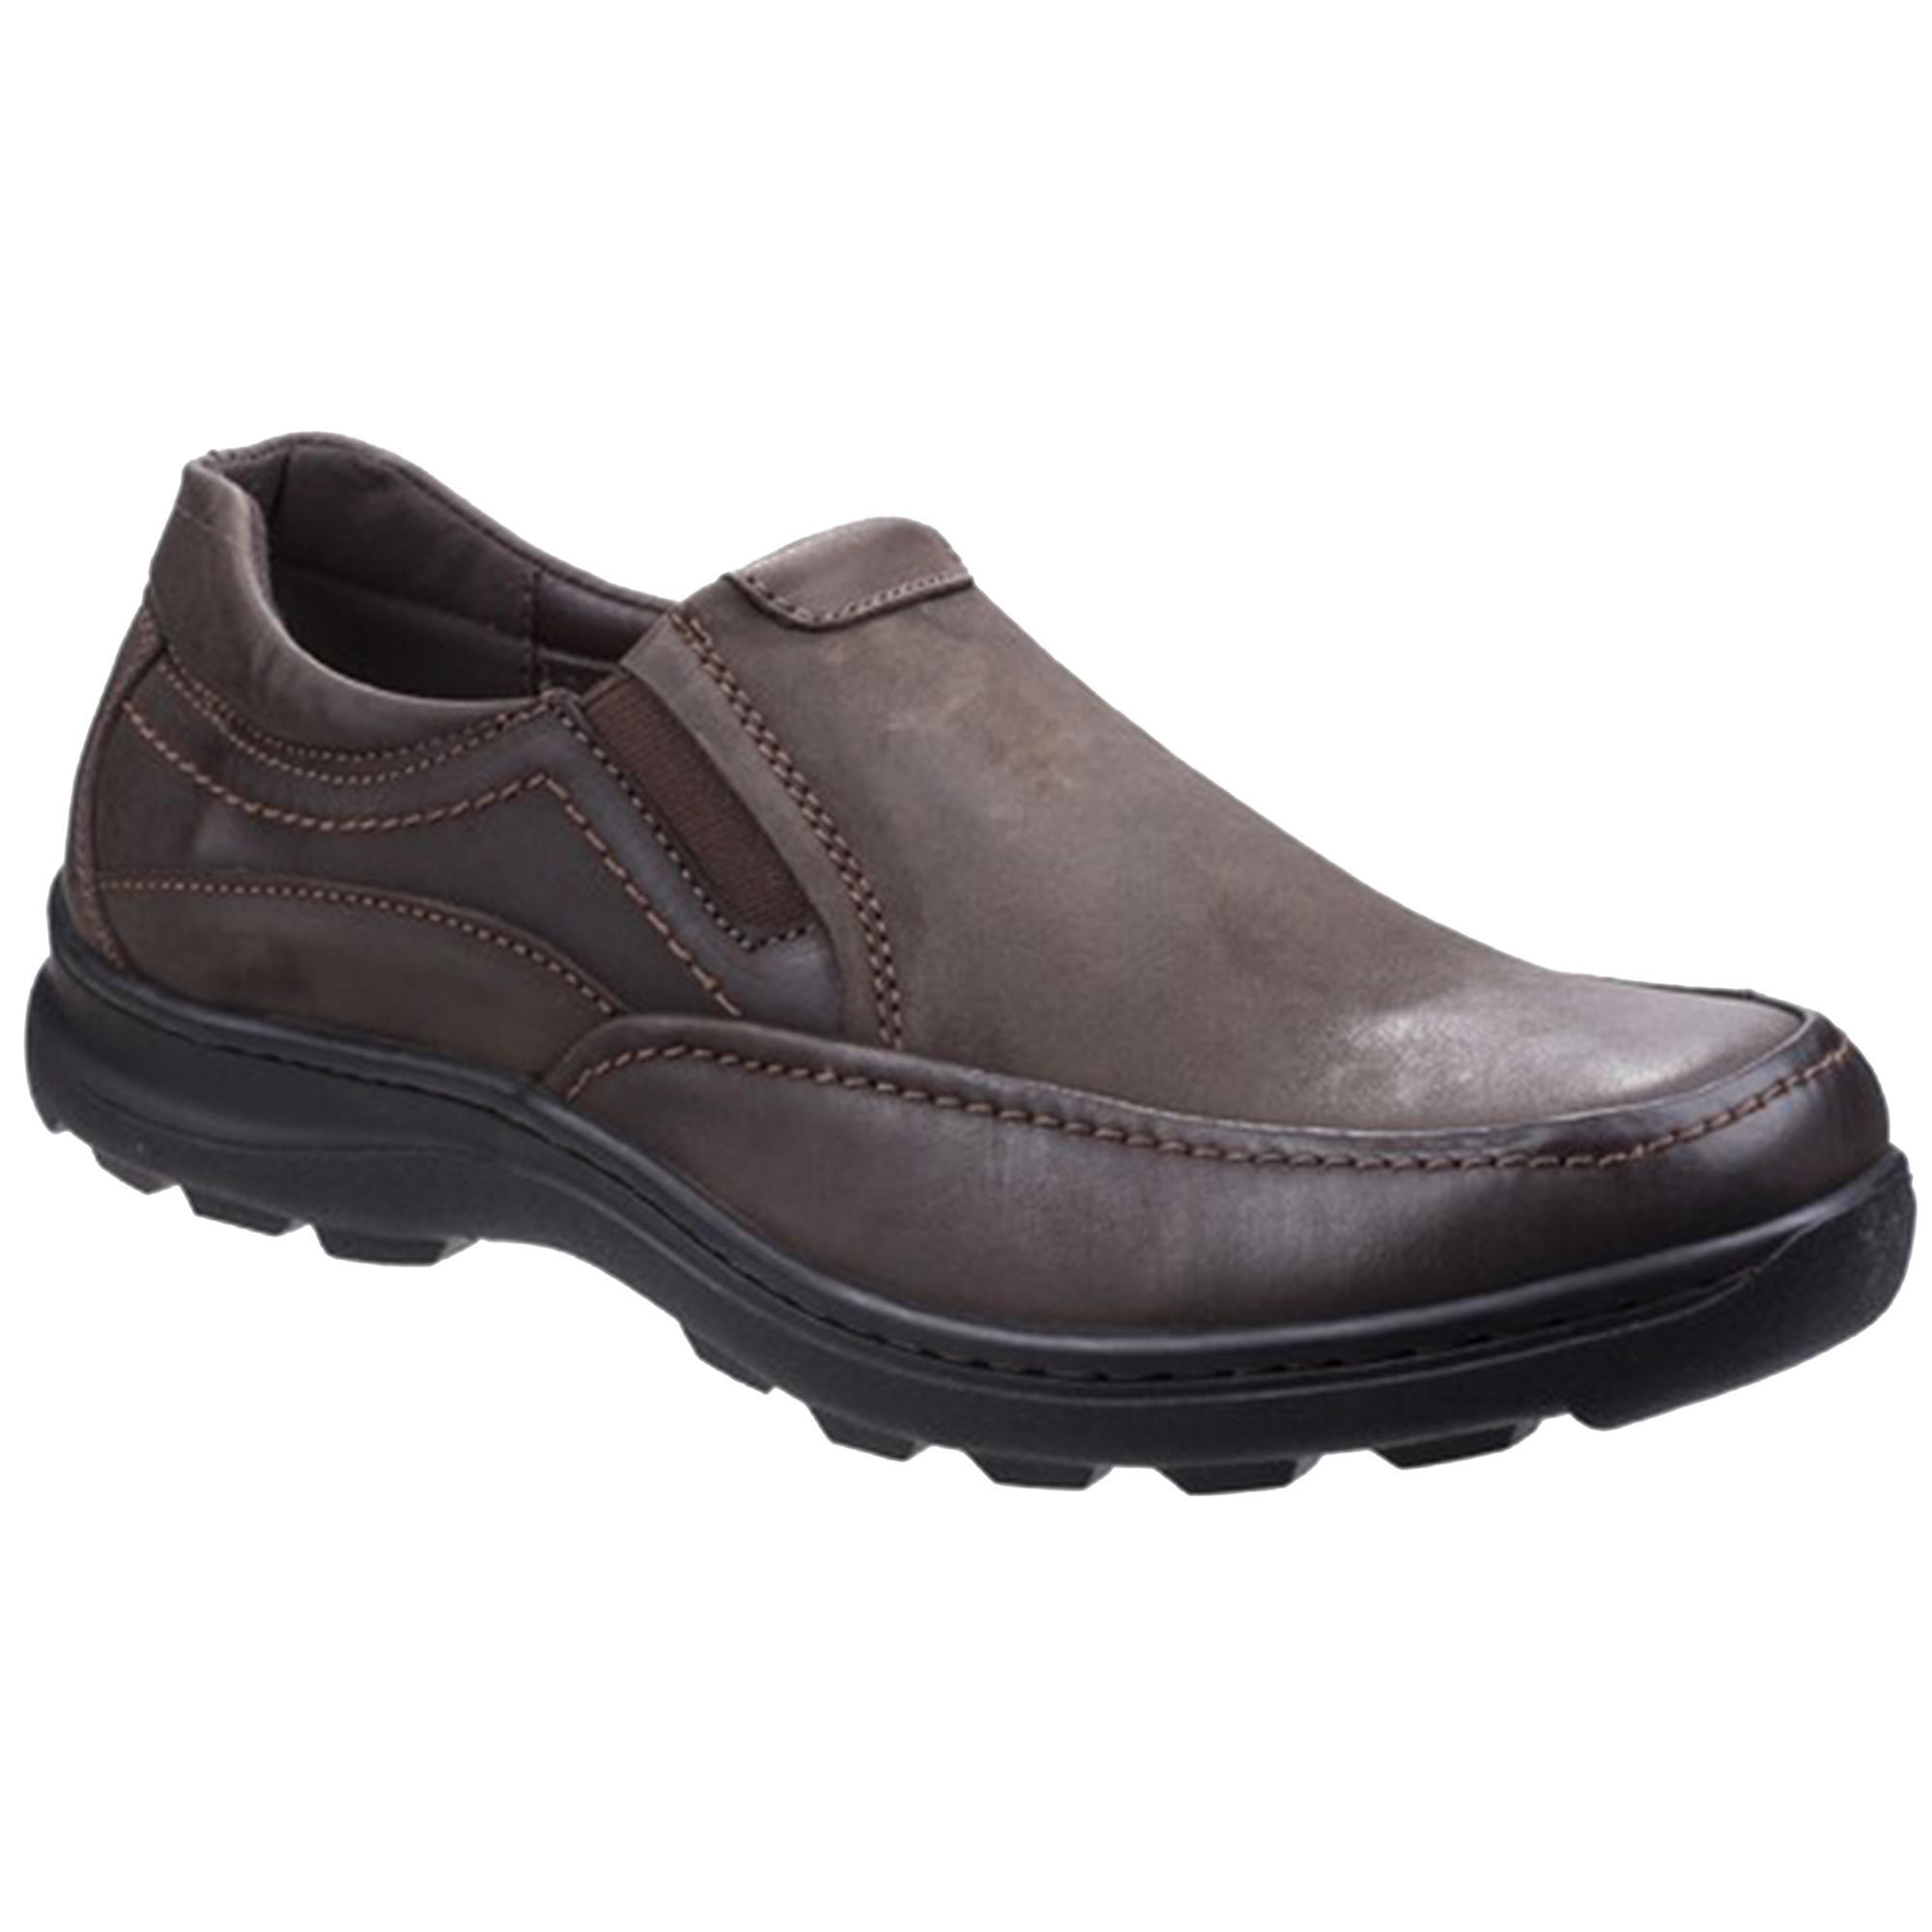 Fleet & Foster Mens Goa Leather Slip-On Shoes hrk07H